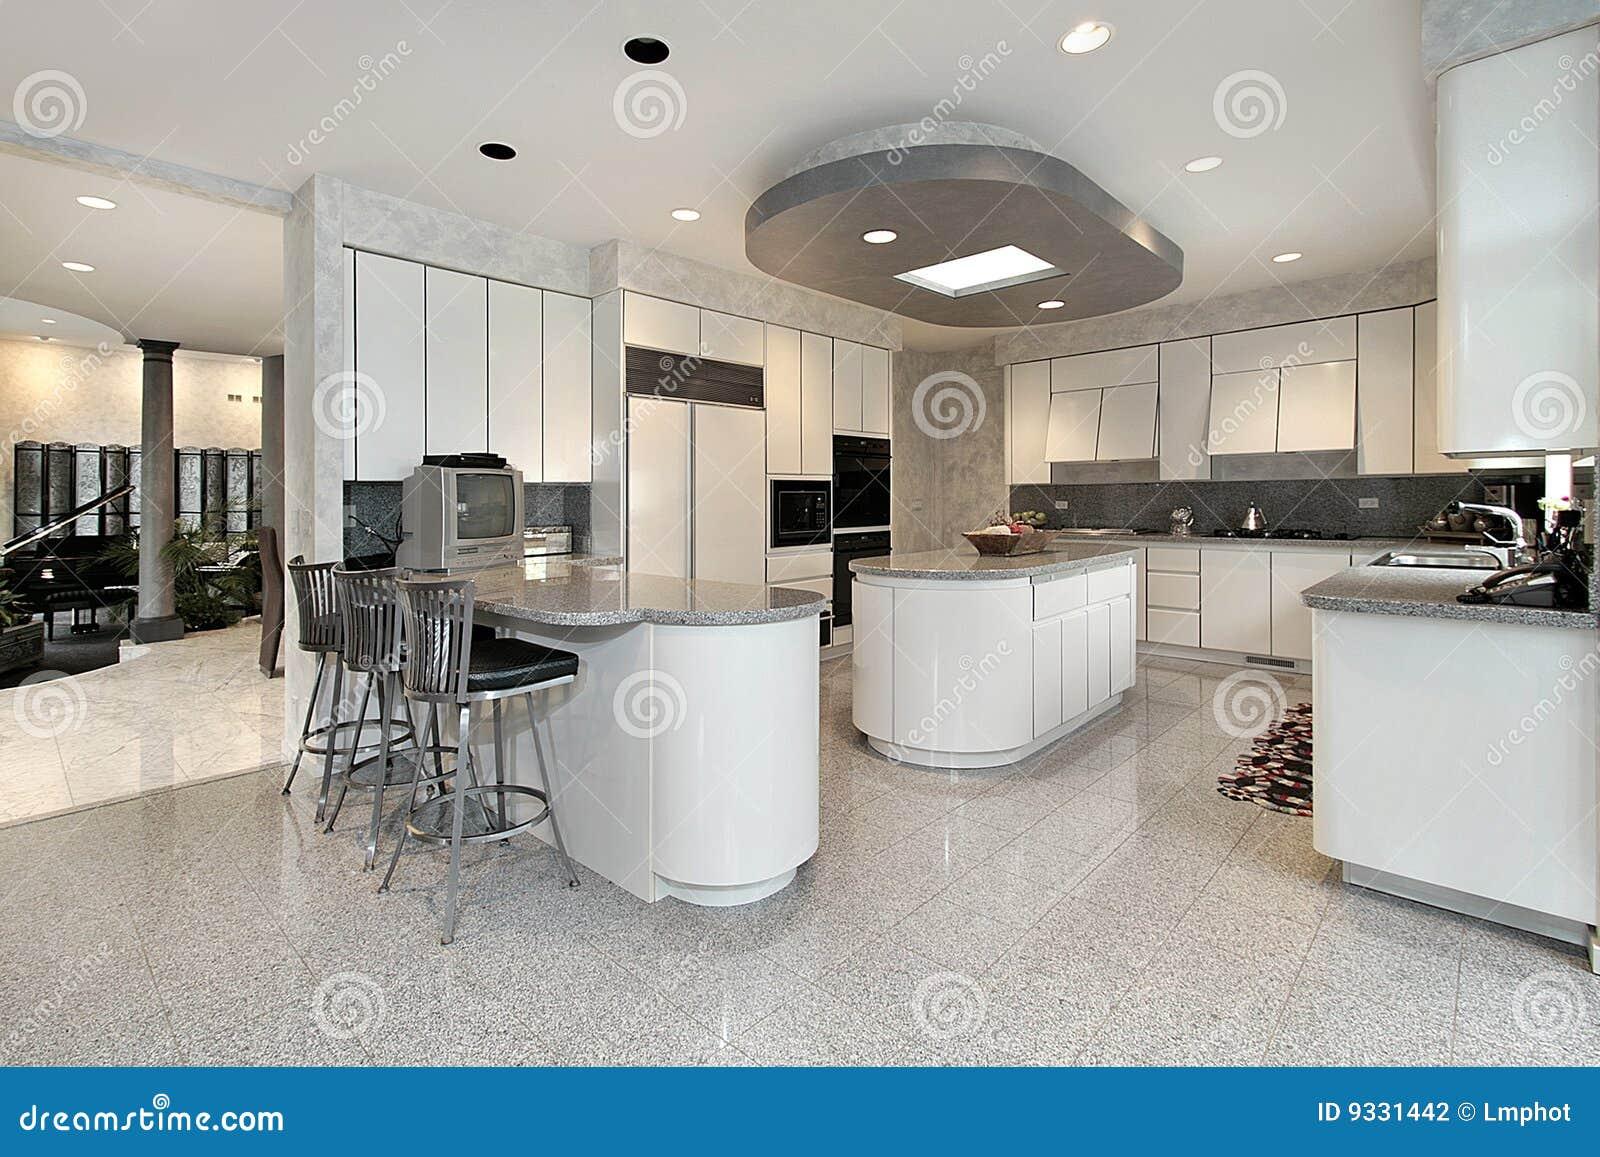 Cucina bianca nella casa di lusso fotografia stock - Cucina di lusso ...